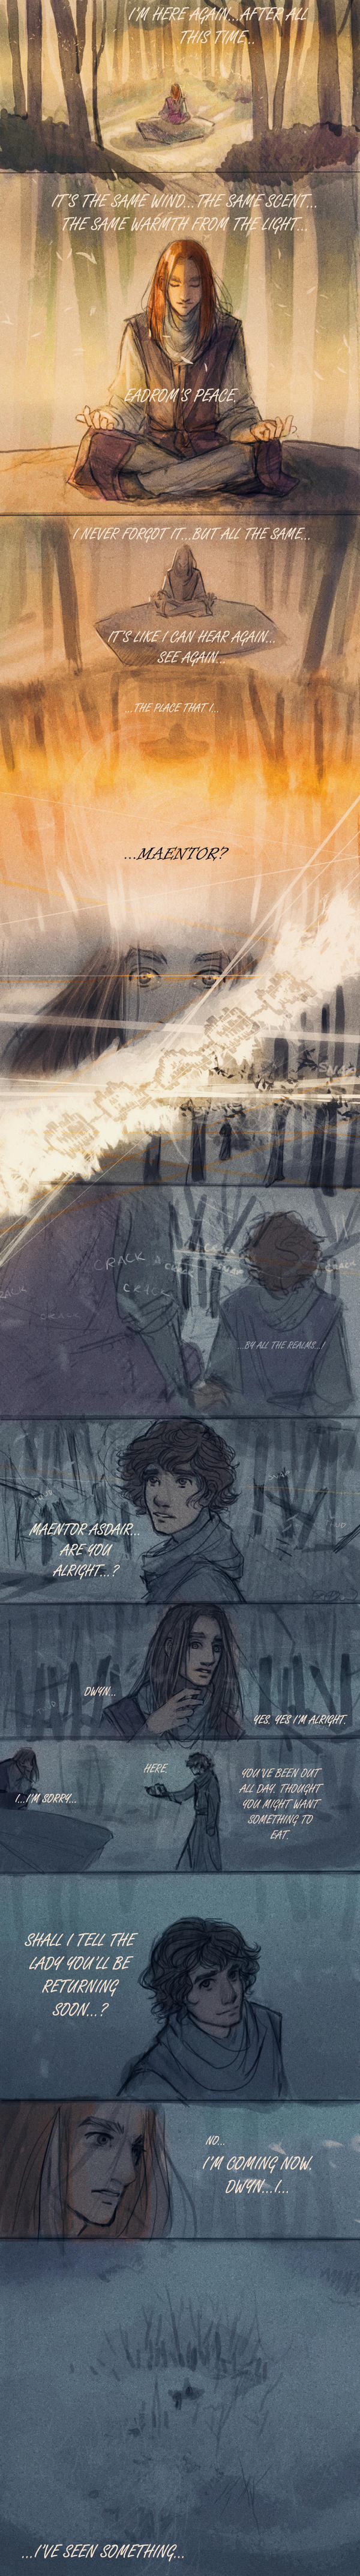 Asdair in the woods by LadyEru